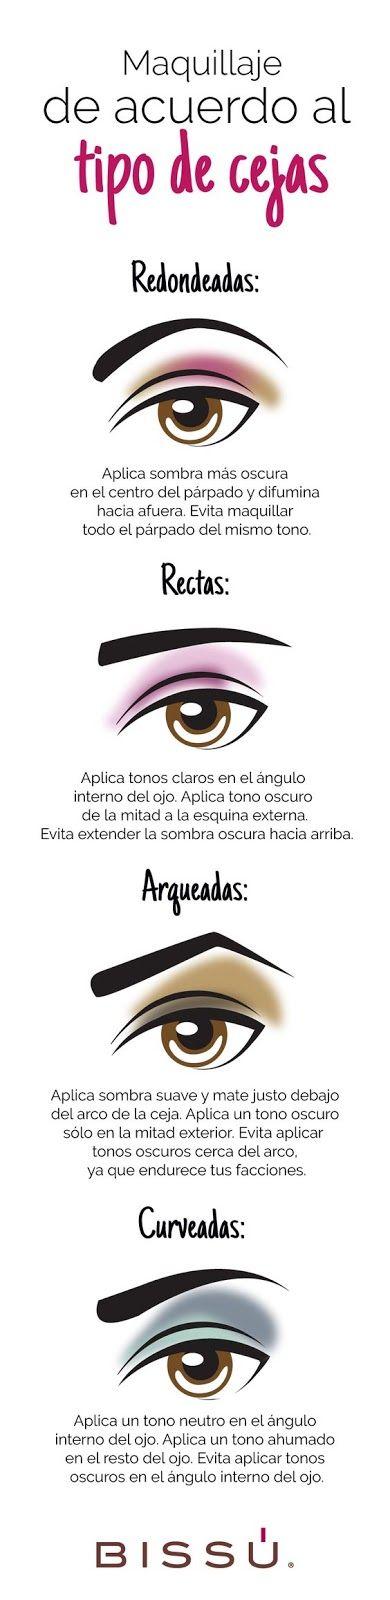 Maquillaje según tus cejas